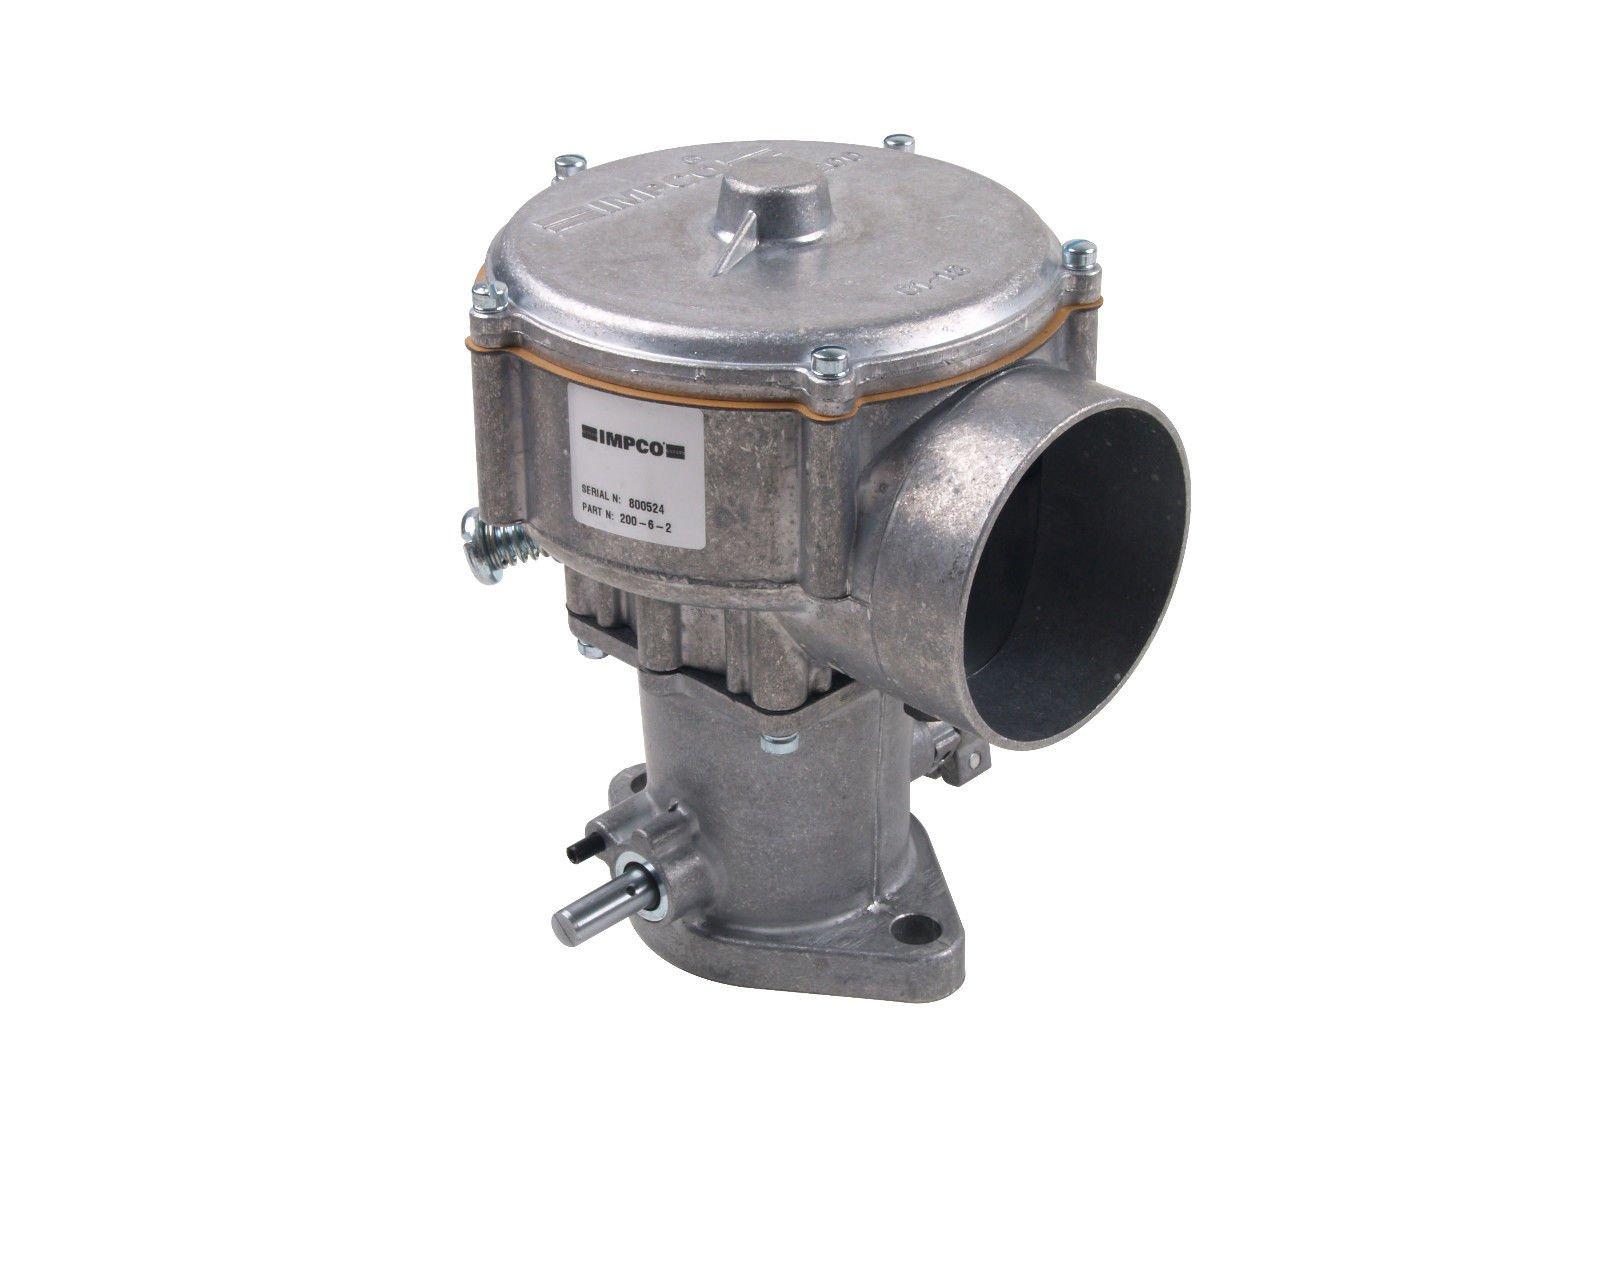 Forklift Supply - Aftermarket Toyota LPG Carburetor90Deg Air Horn PN 005911465181